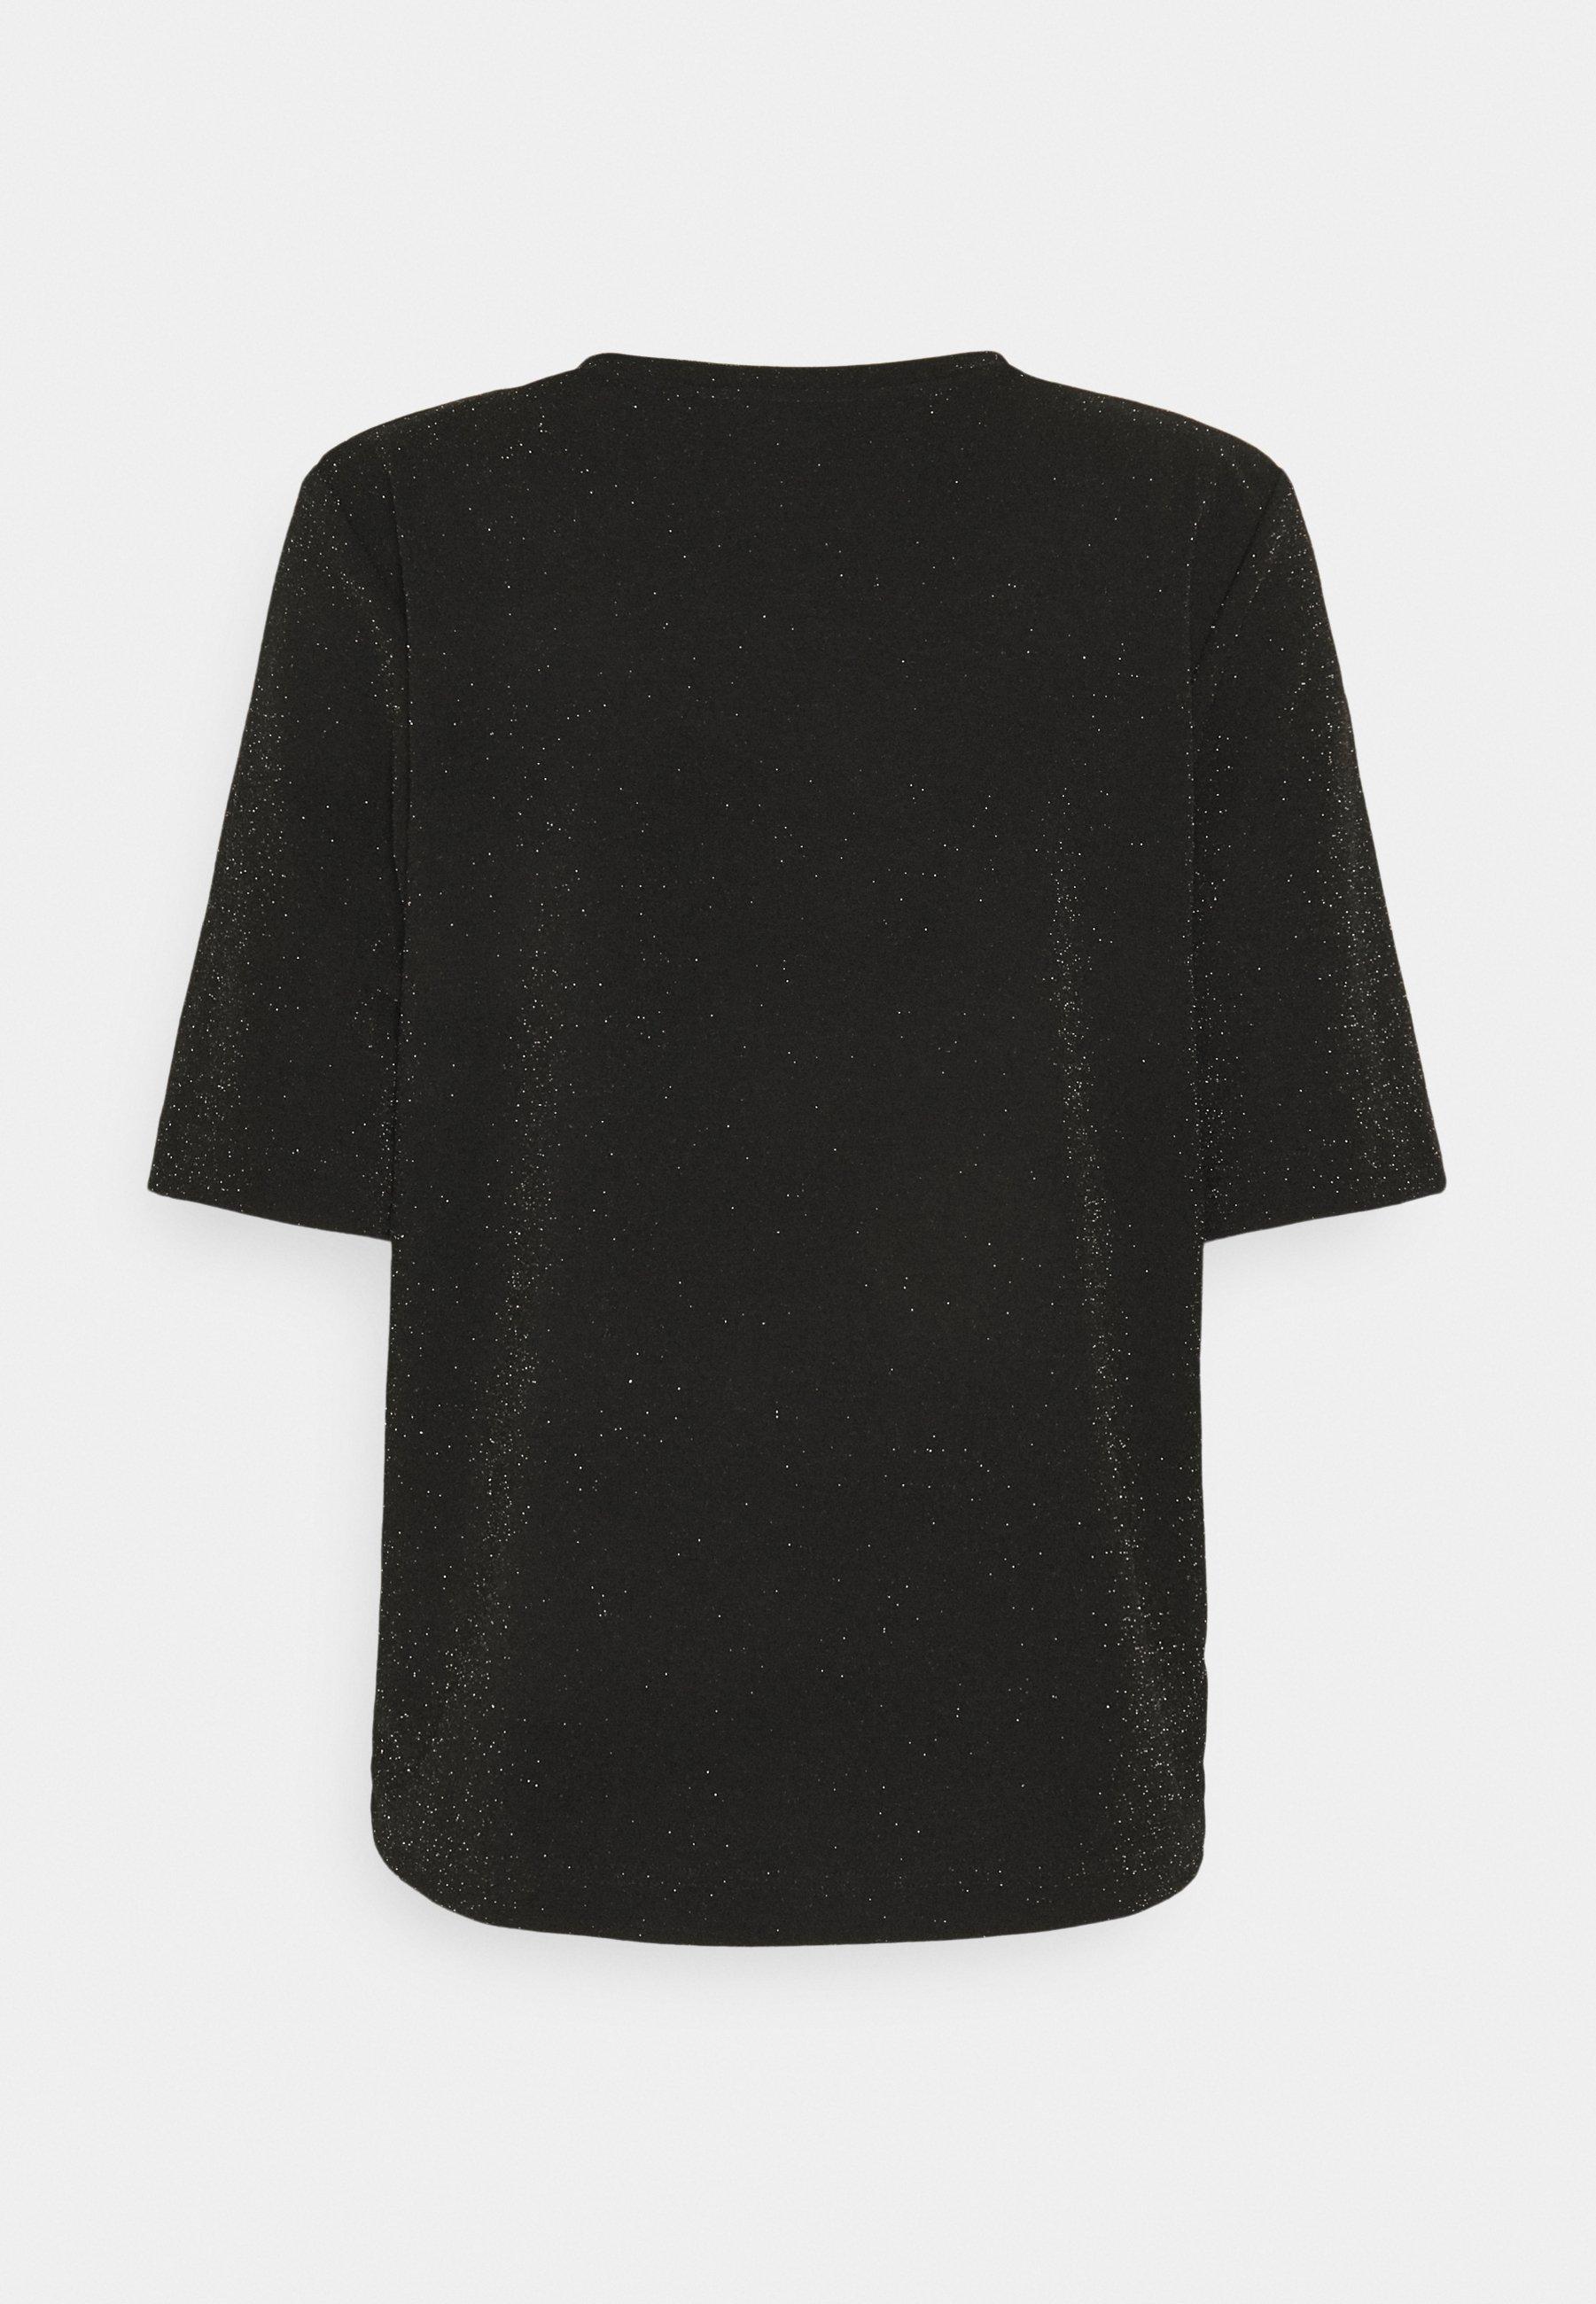 Inwear Floyd - T-shirts Med Print Black/svart